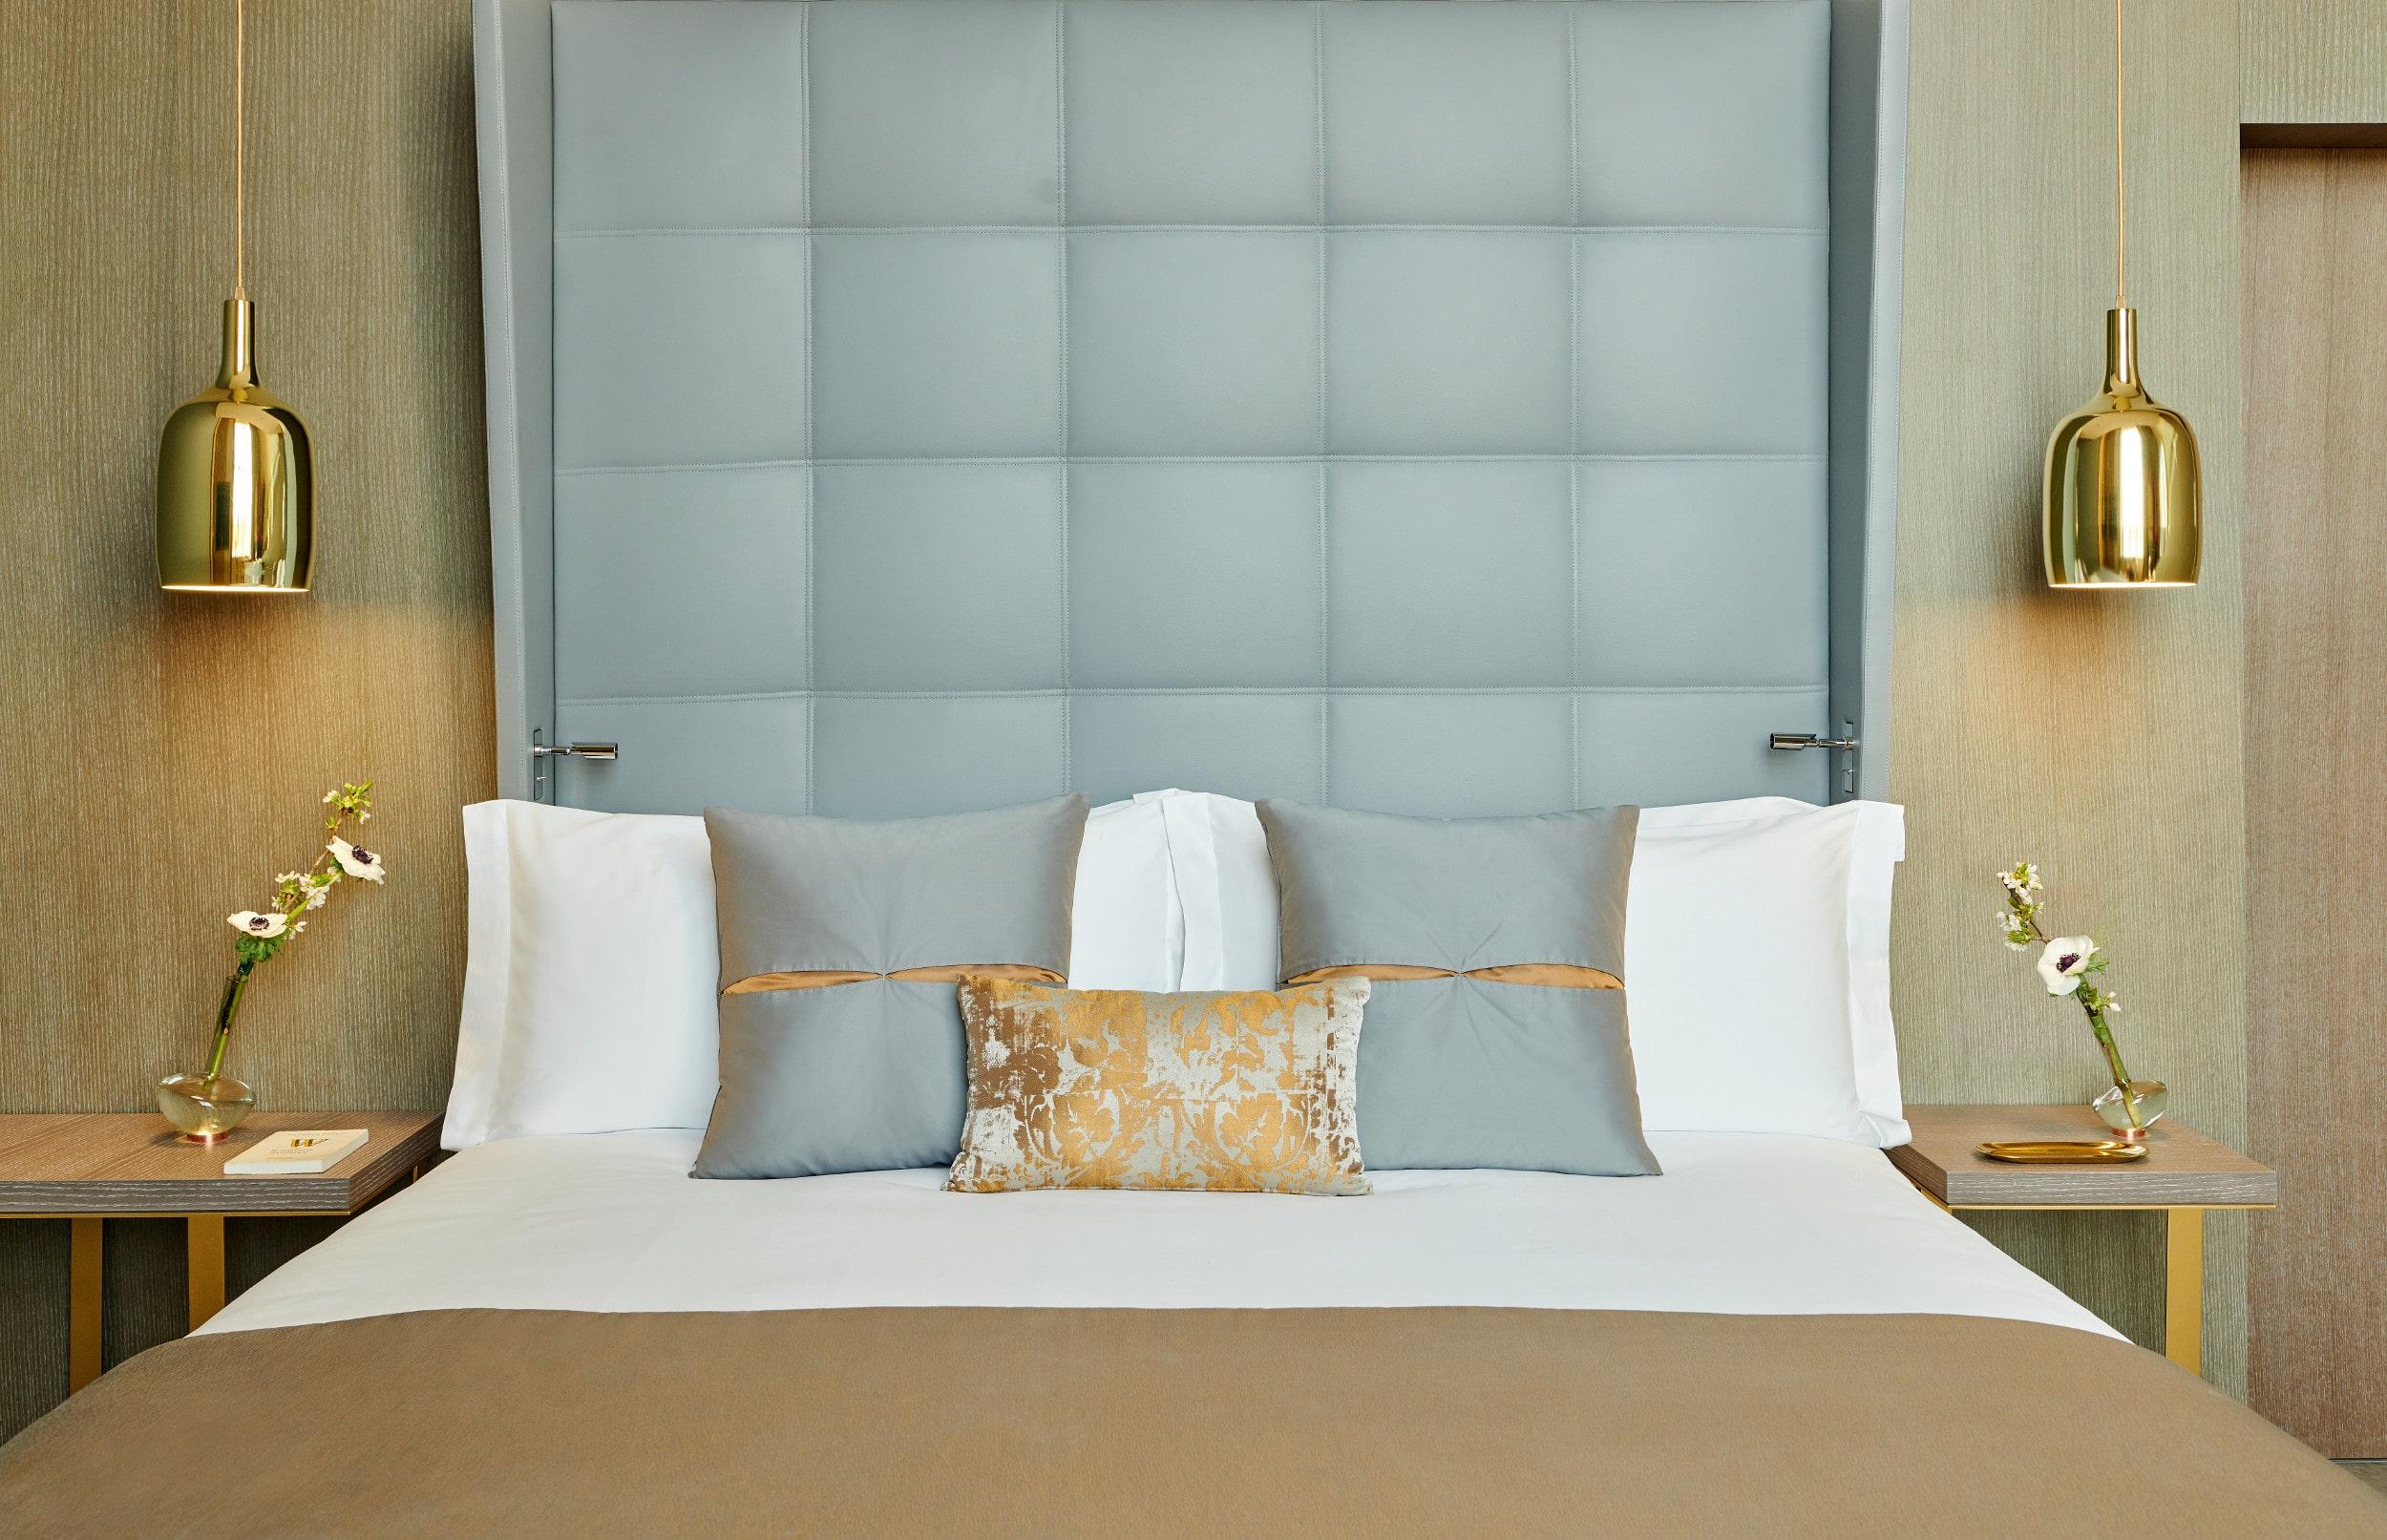 InterContinental Lyon - Hotel Dieu - Hotel de Luxe France - chambre